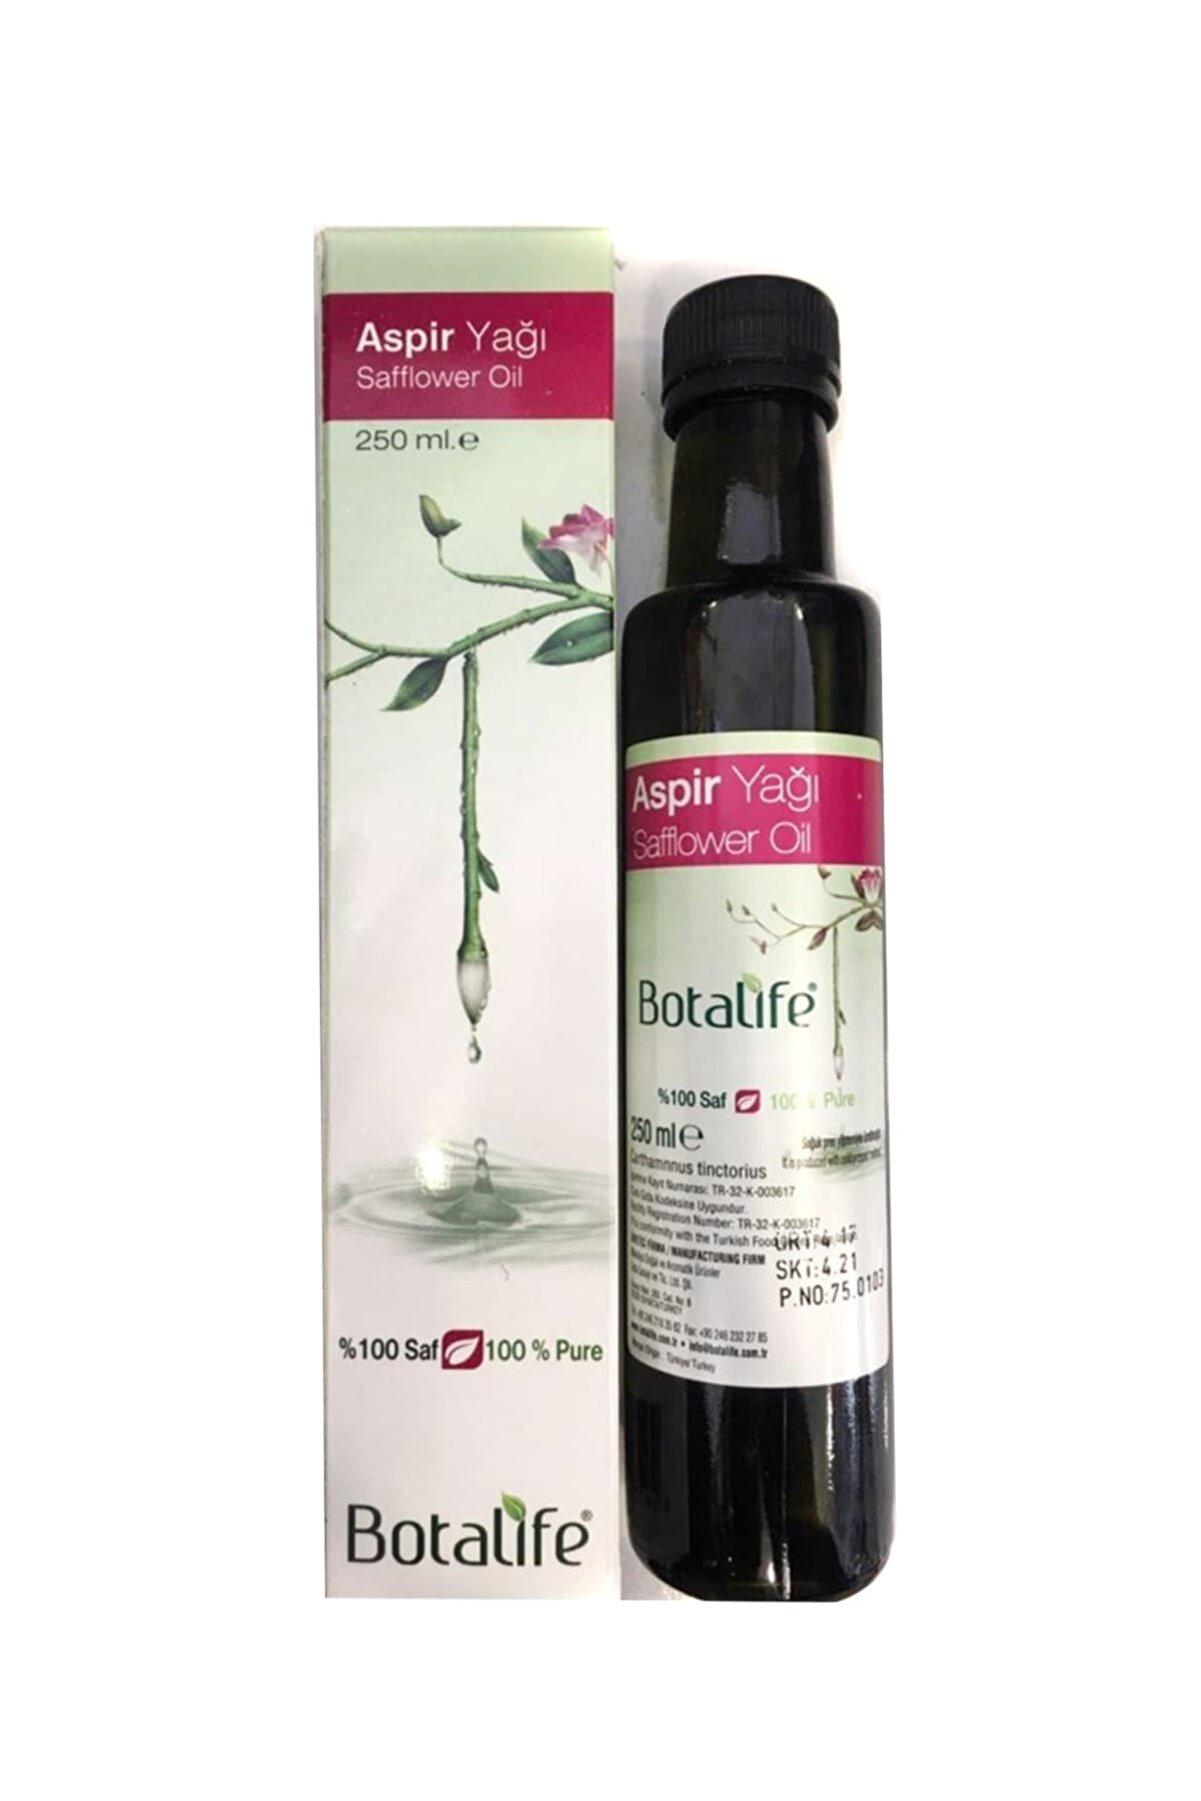 Botalife Aspir Yağı %100 Saf 250ml